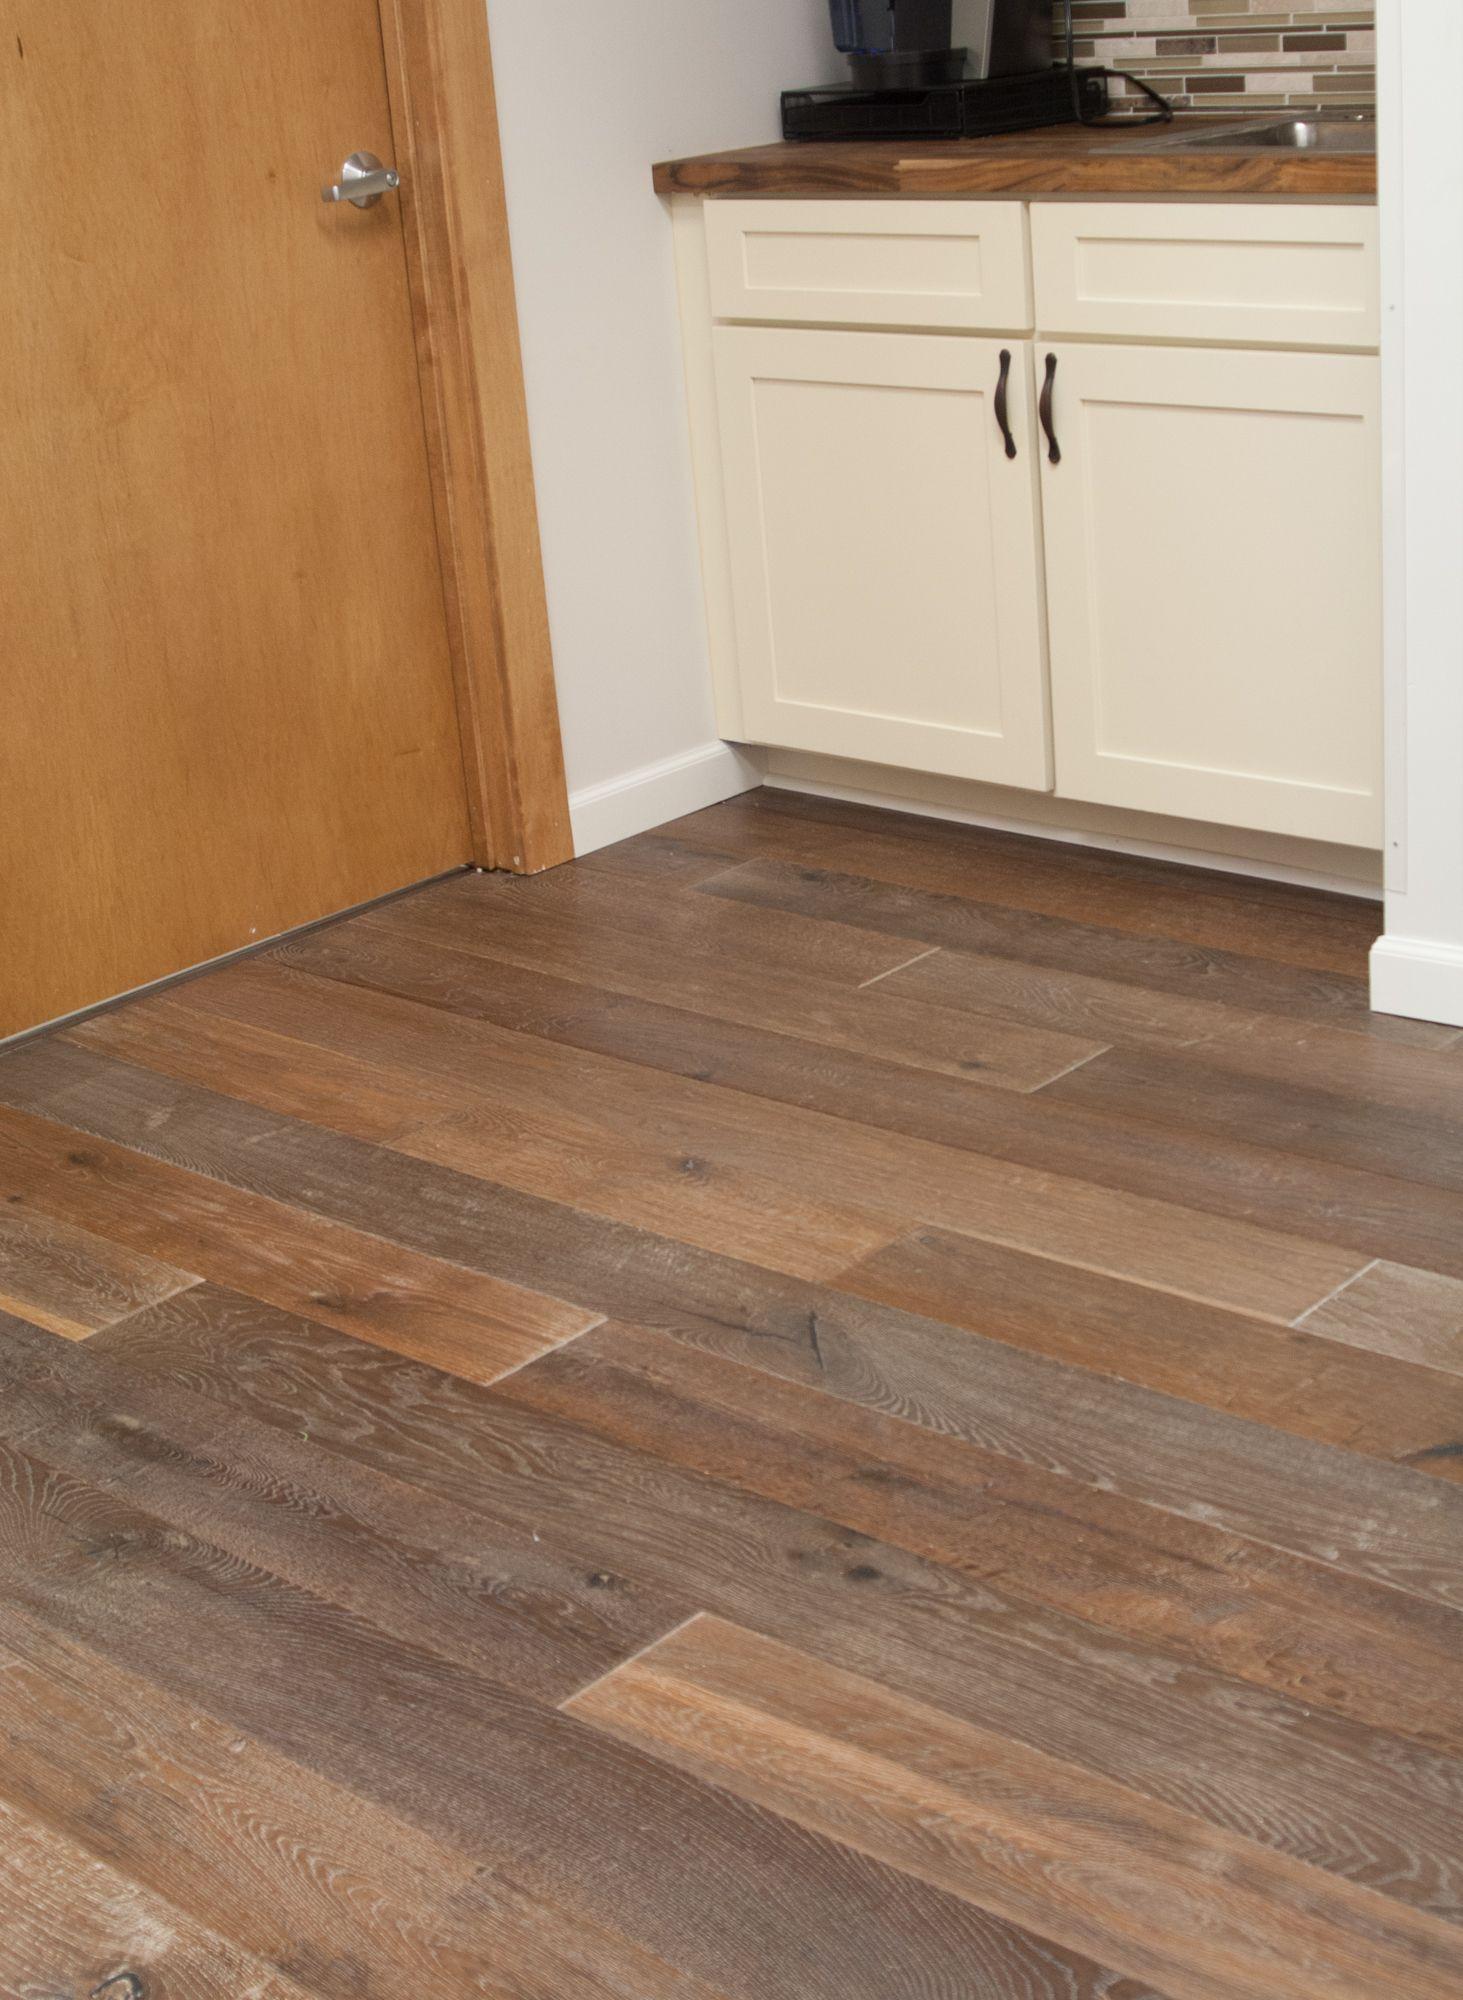 preparing hardwood floors for sanding of sanding wood floors floor plan ideas for sanding wood floors vintage white oak costa hardwood floor home ideas